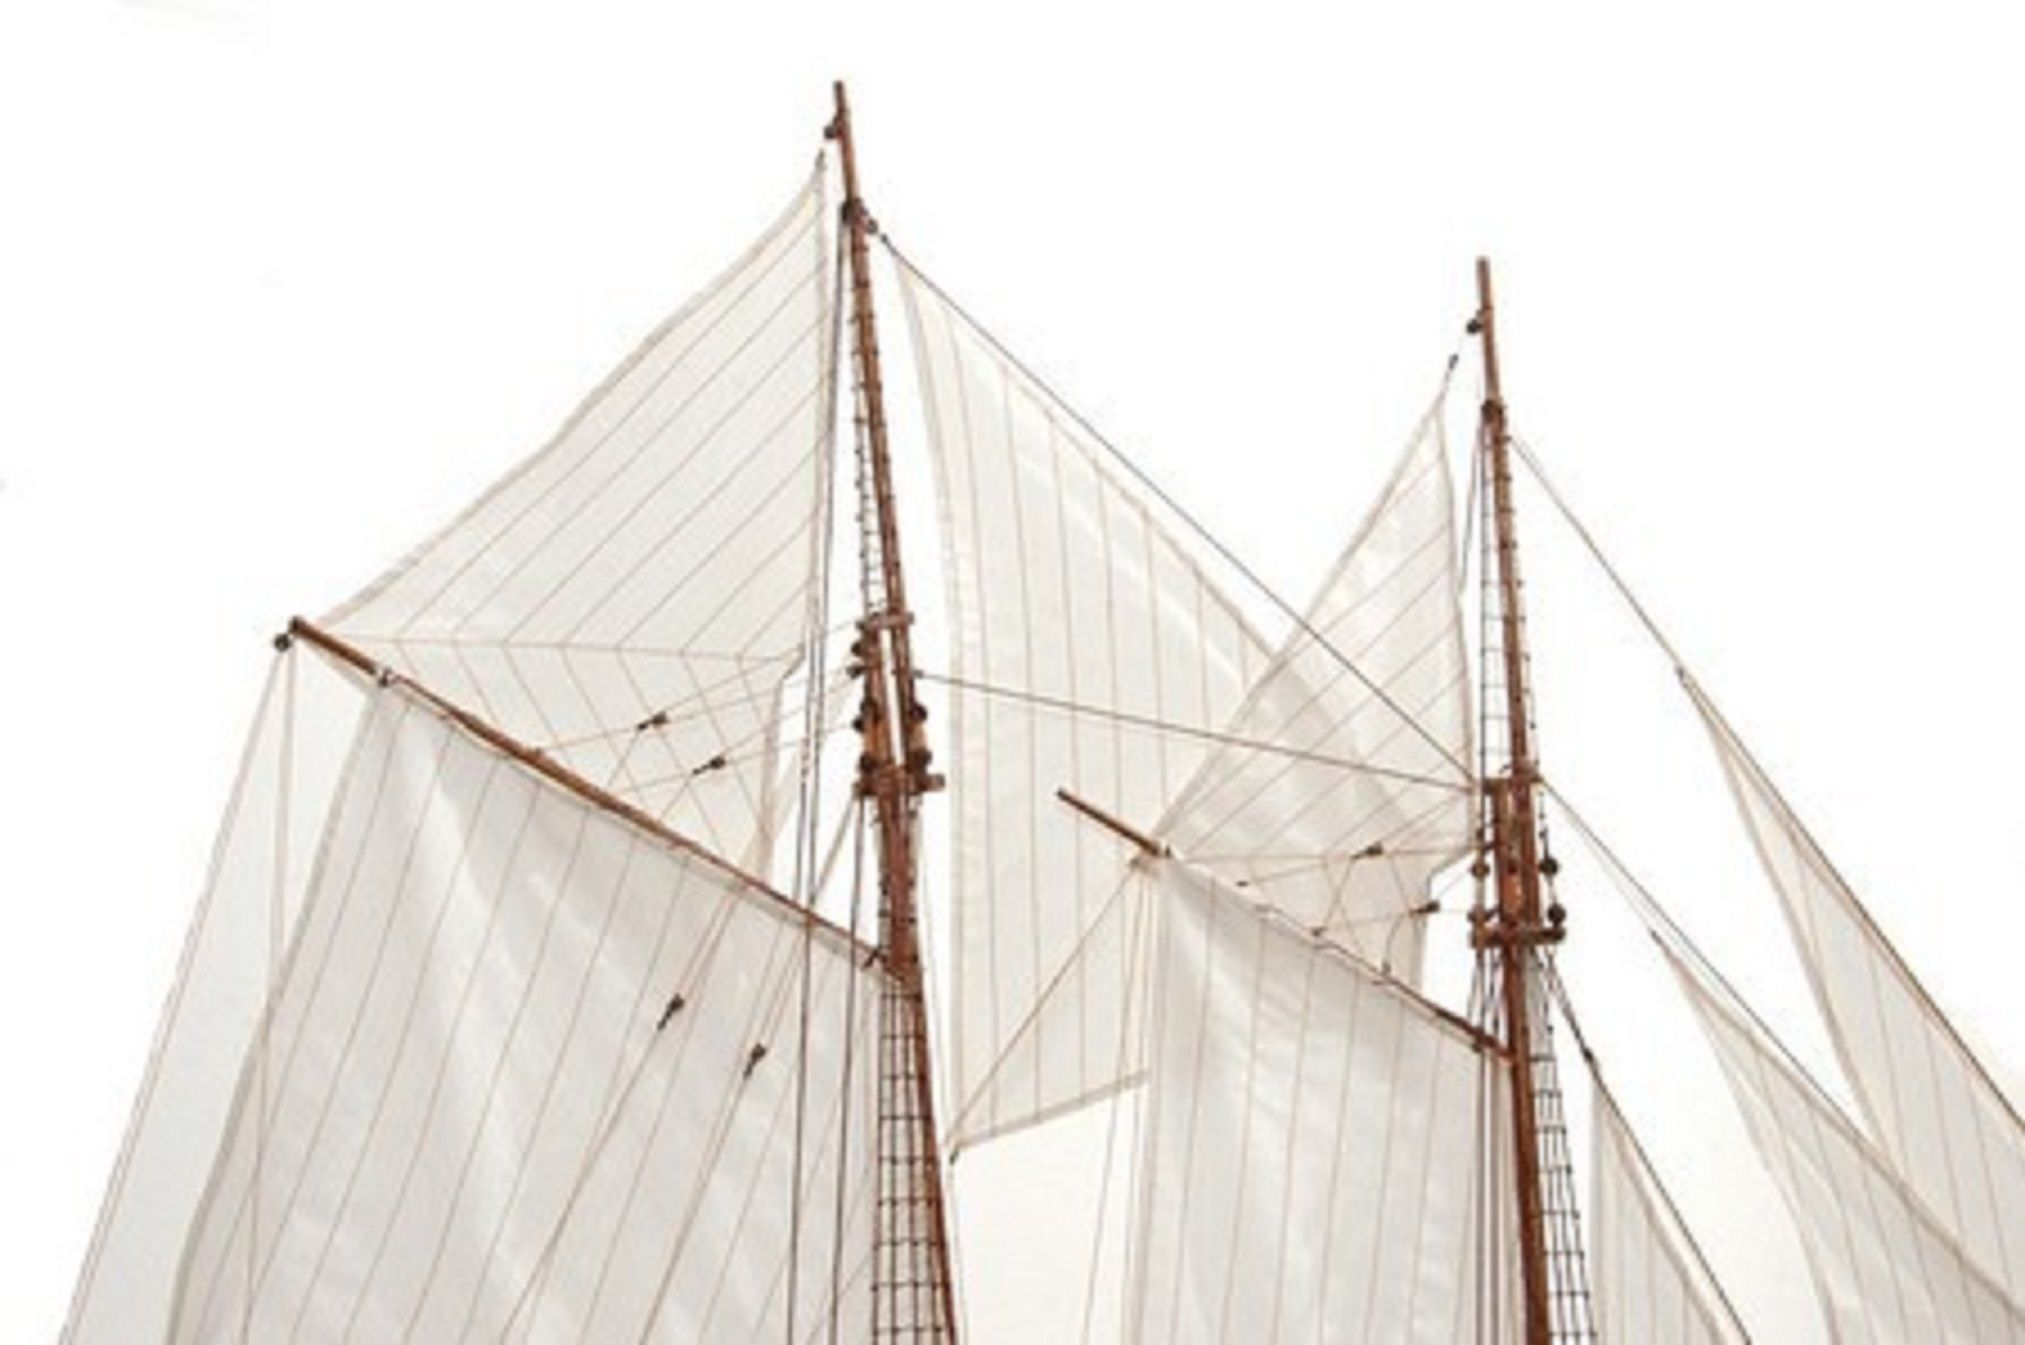 471-6972-Blue-Nose-II-Model-Yacht-Premier-Range